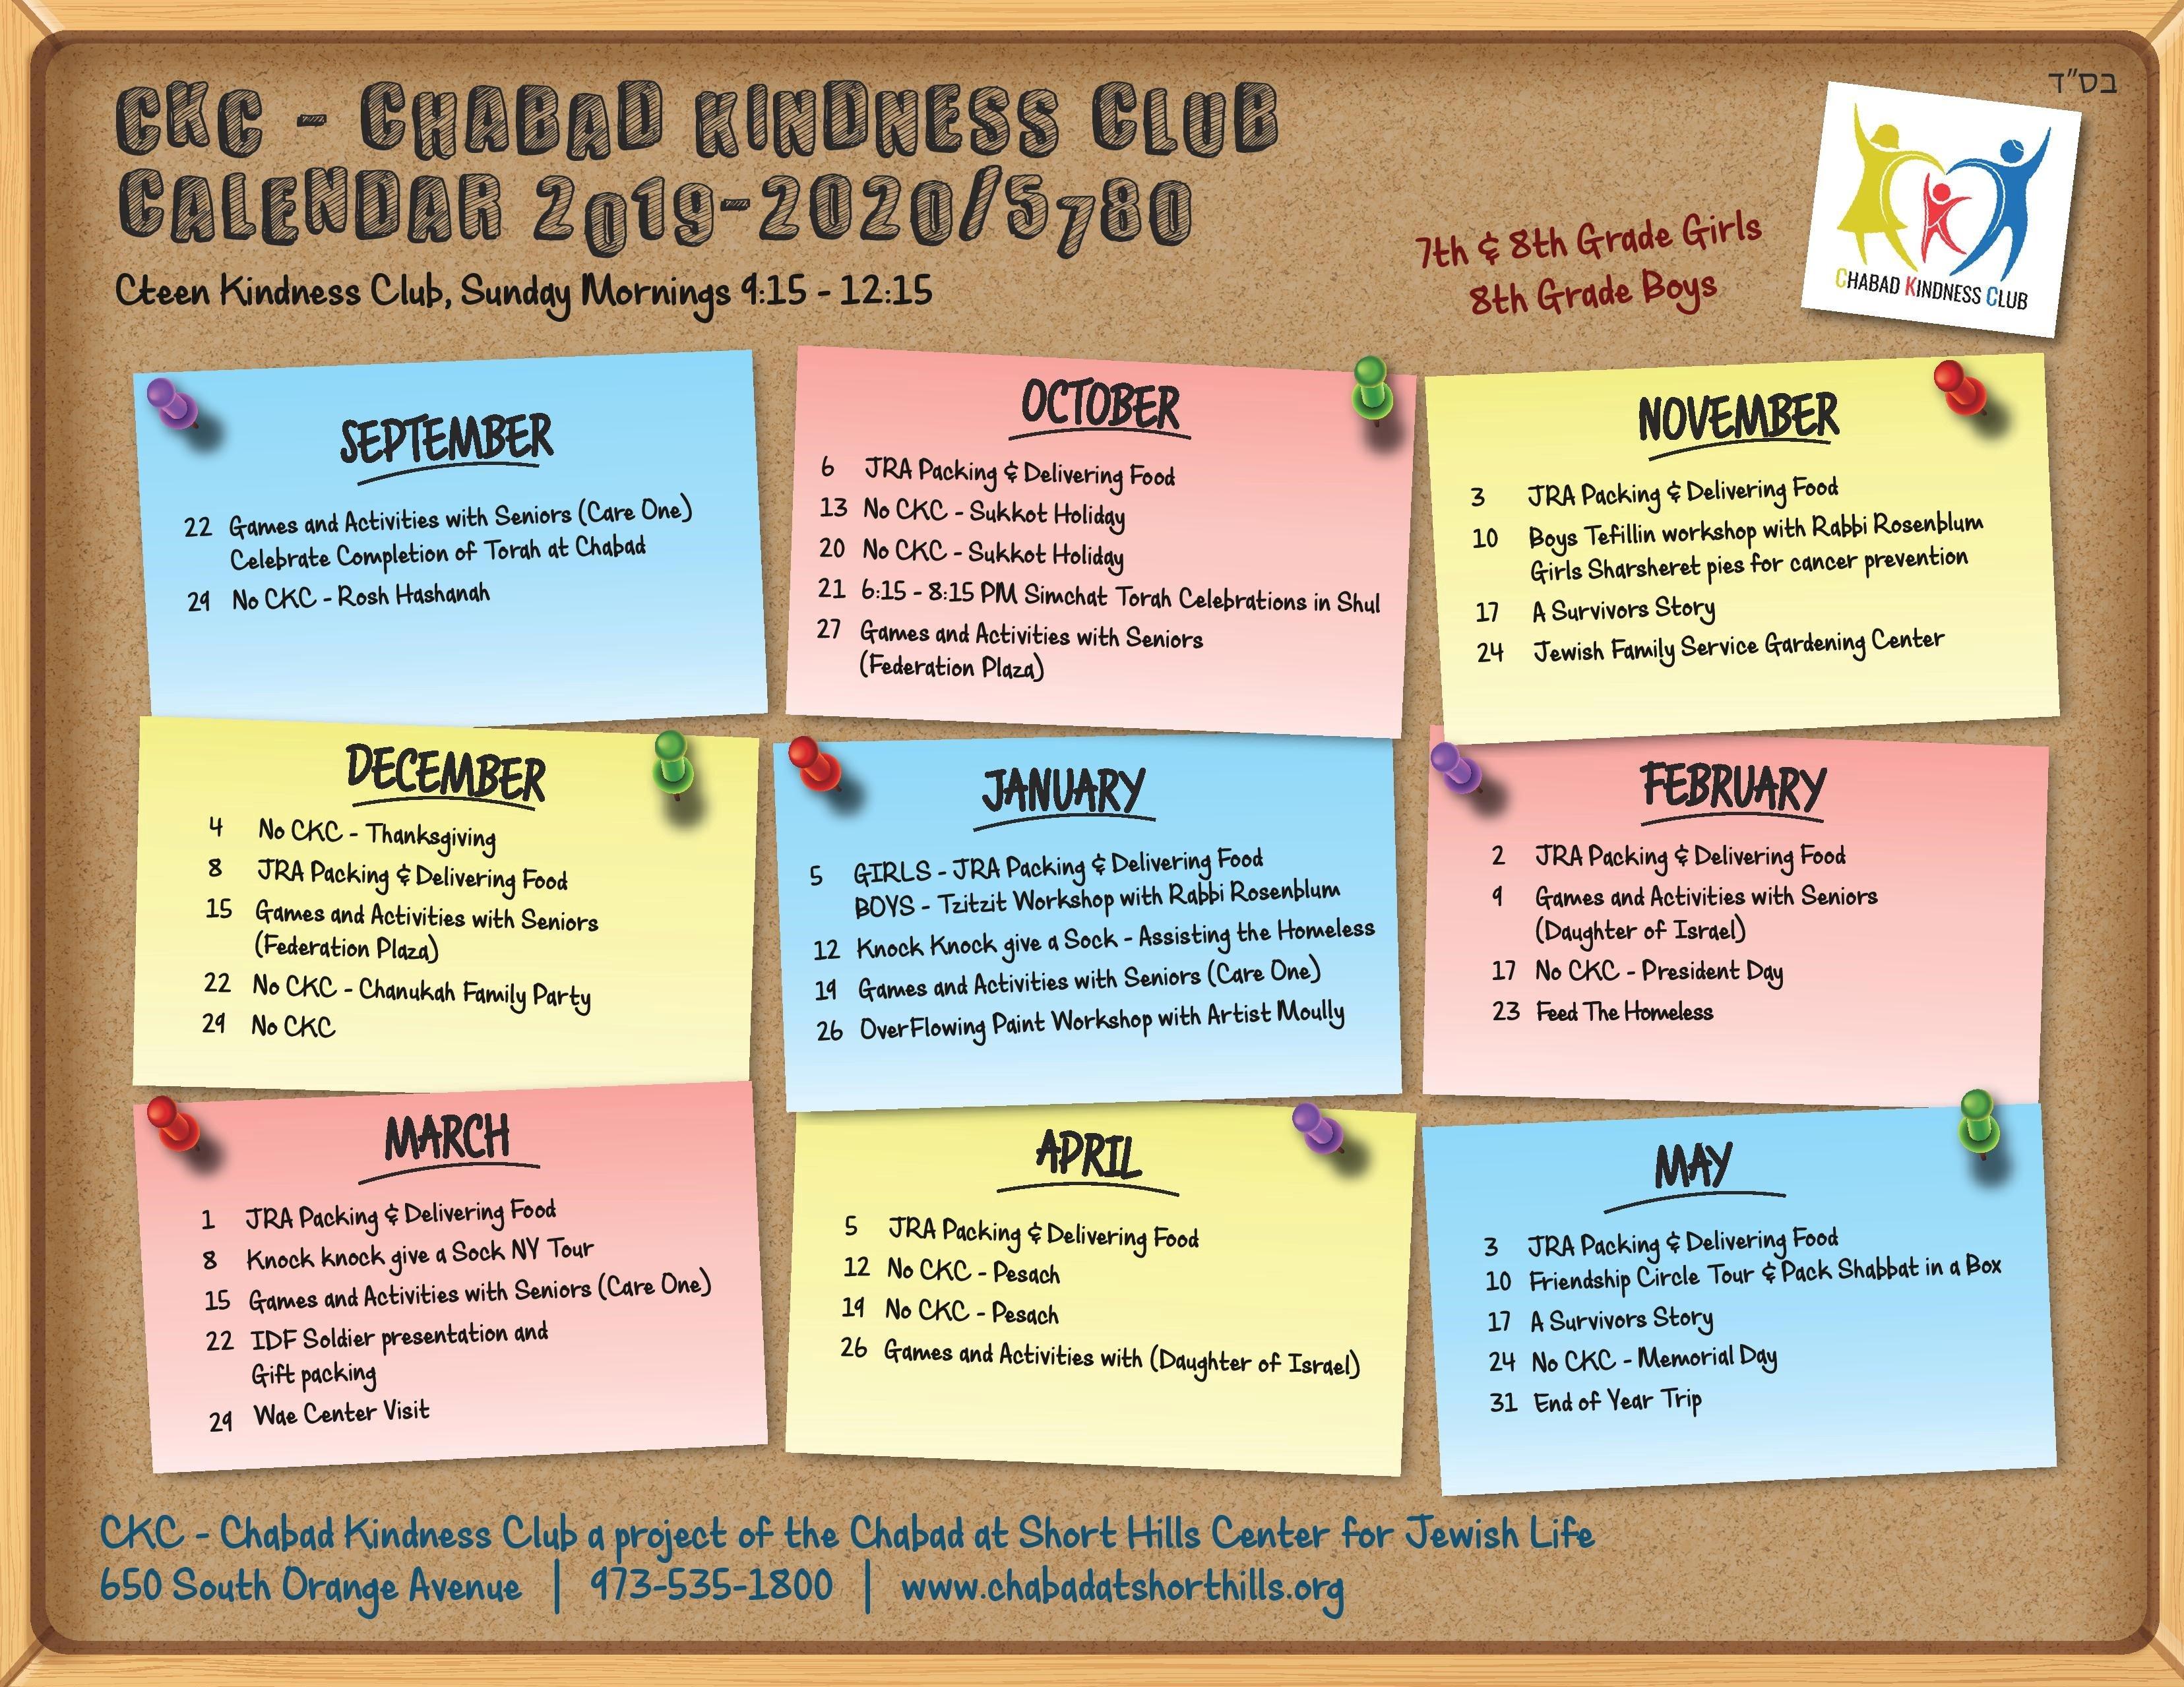 Final Final Chabad Kindness Club-calendar.jpg